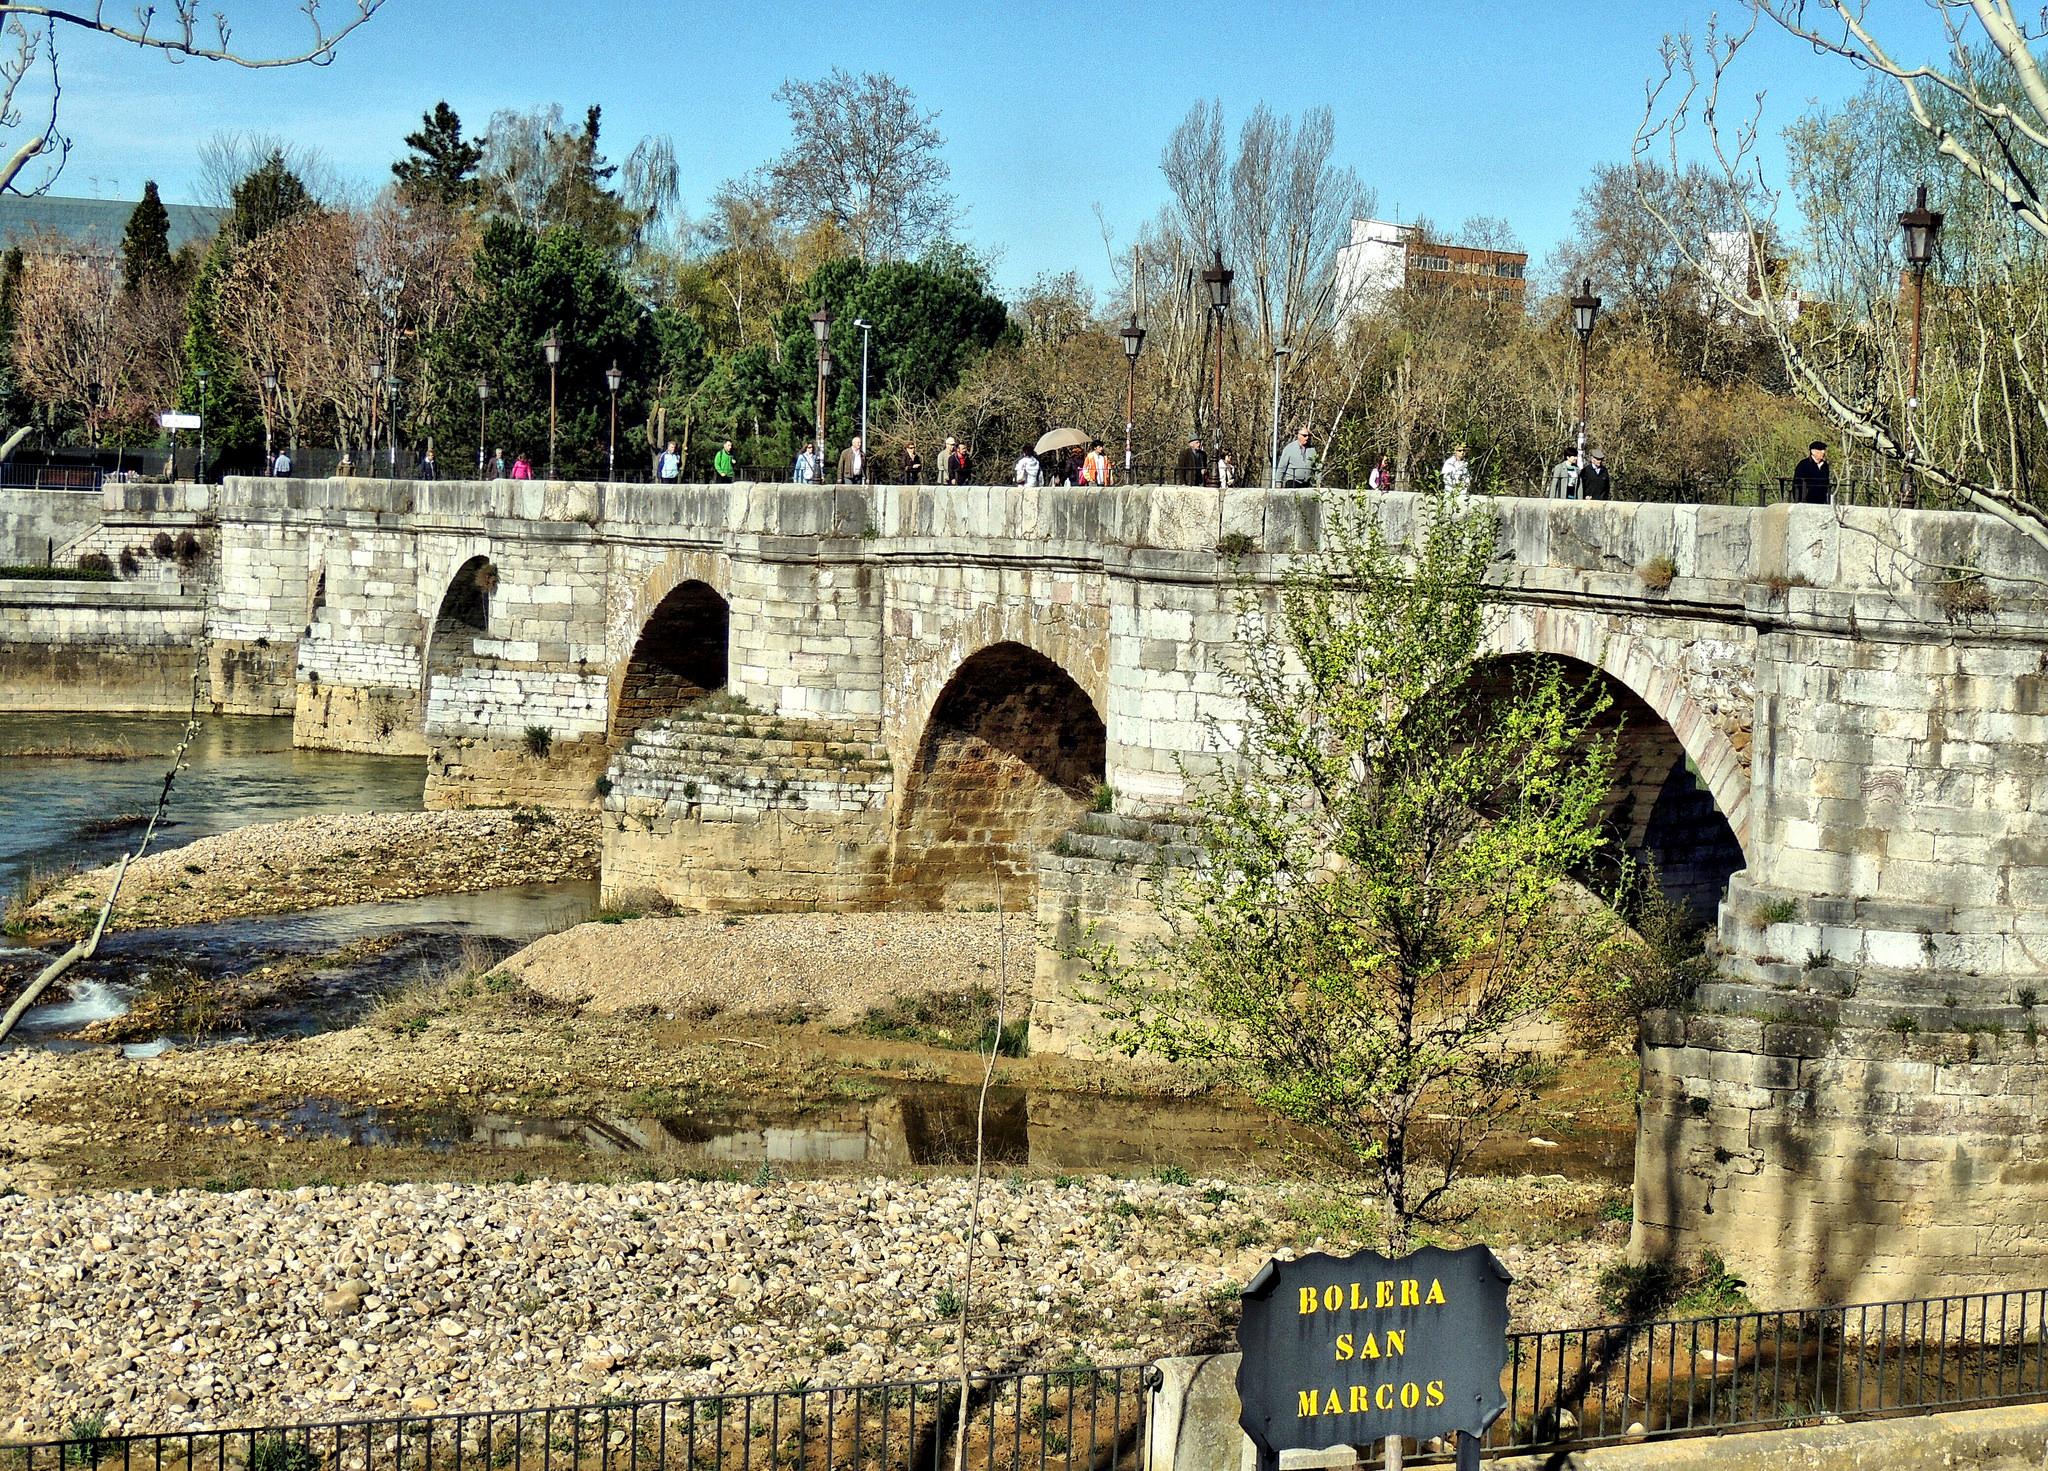 San Marcos Bridge